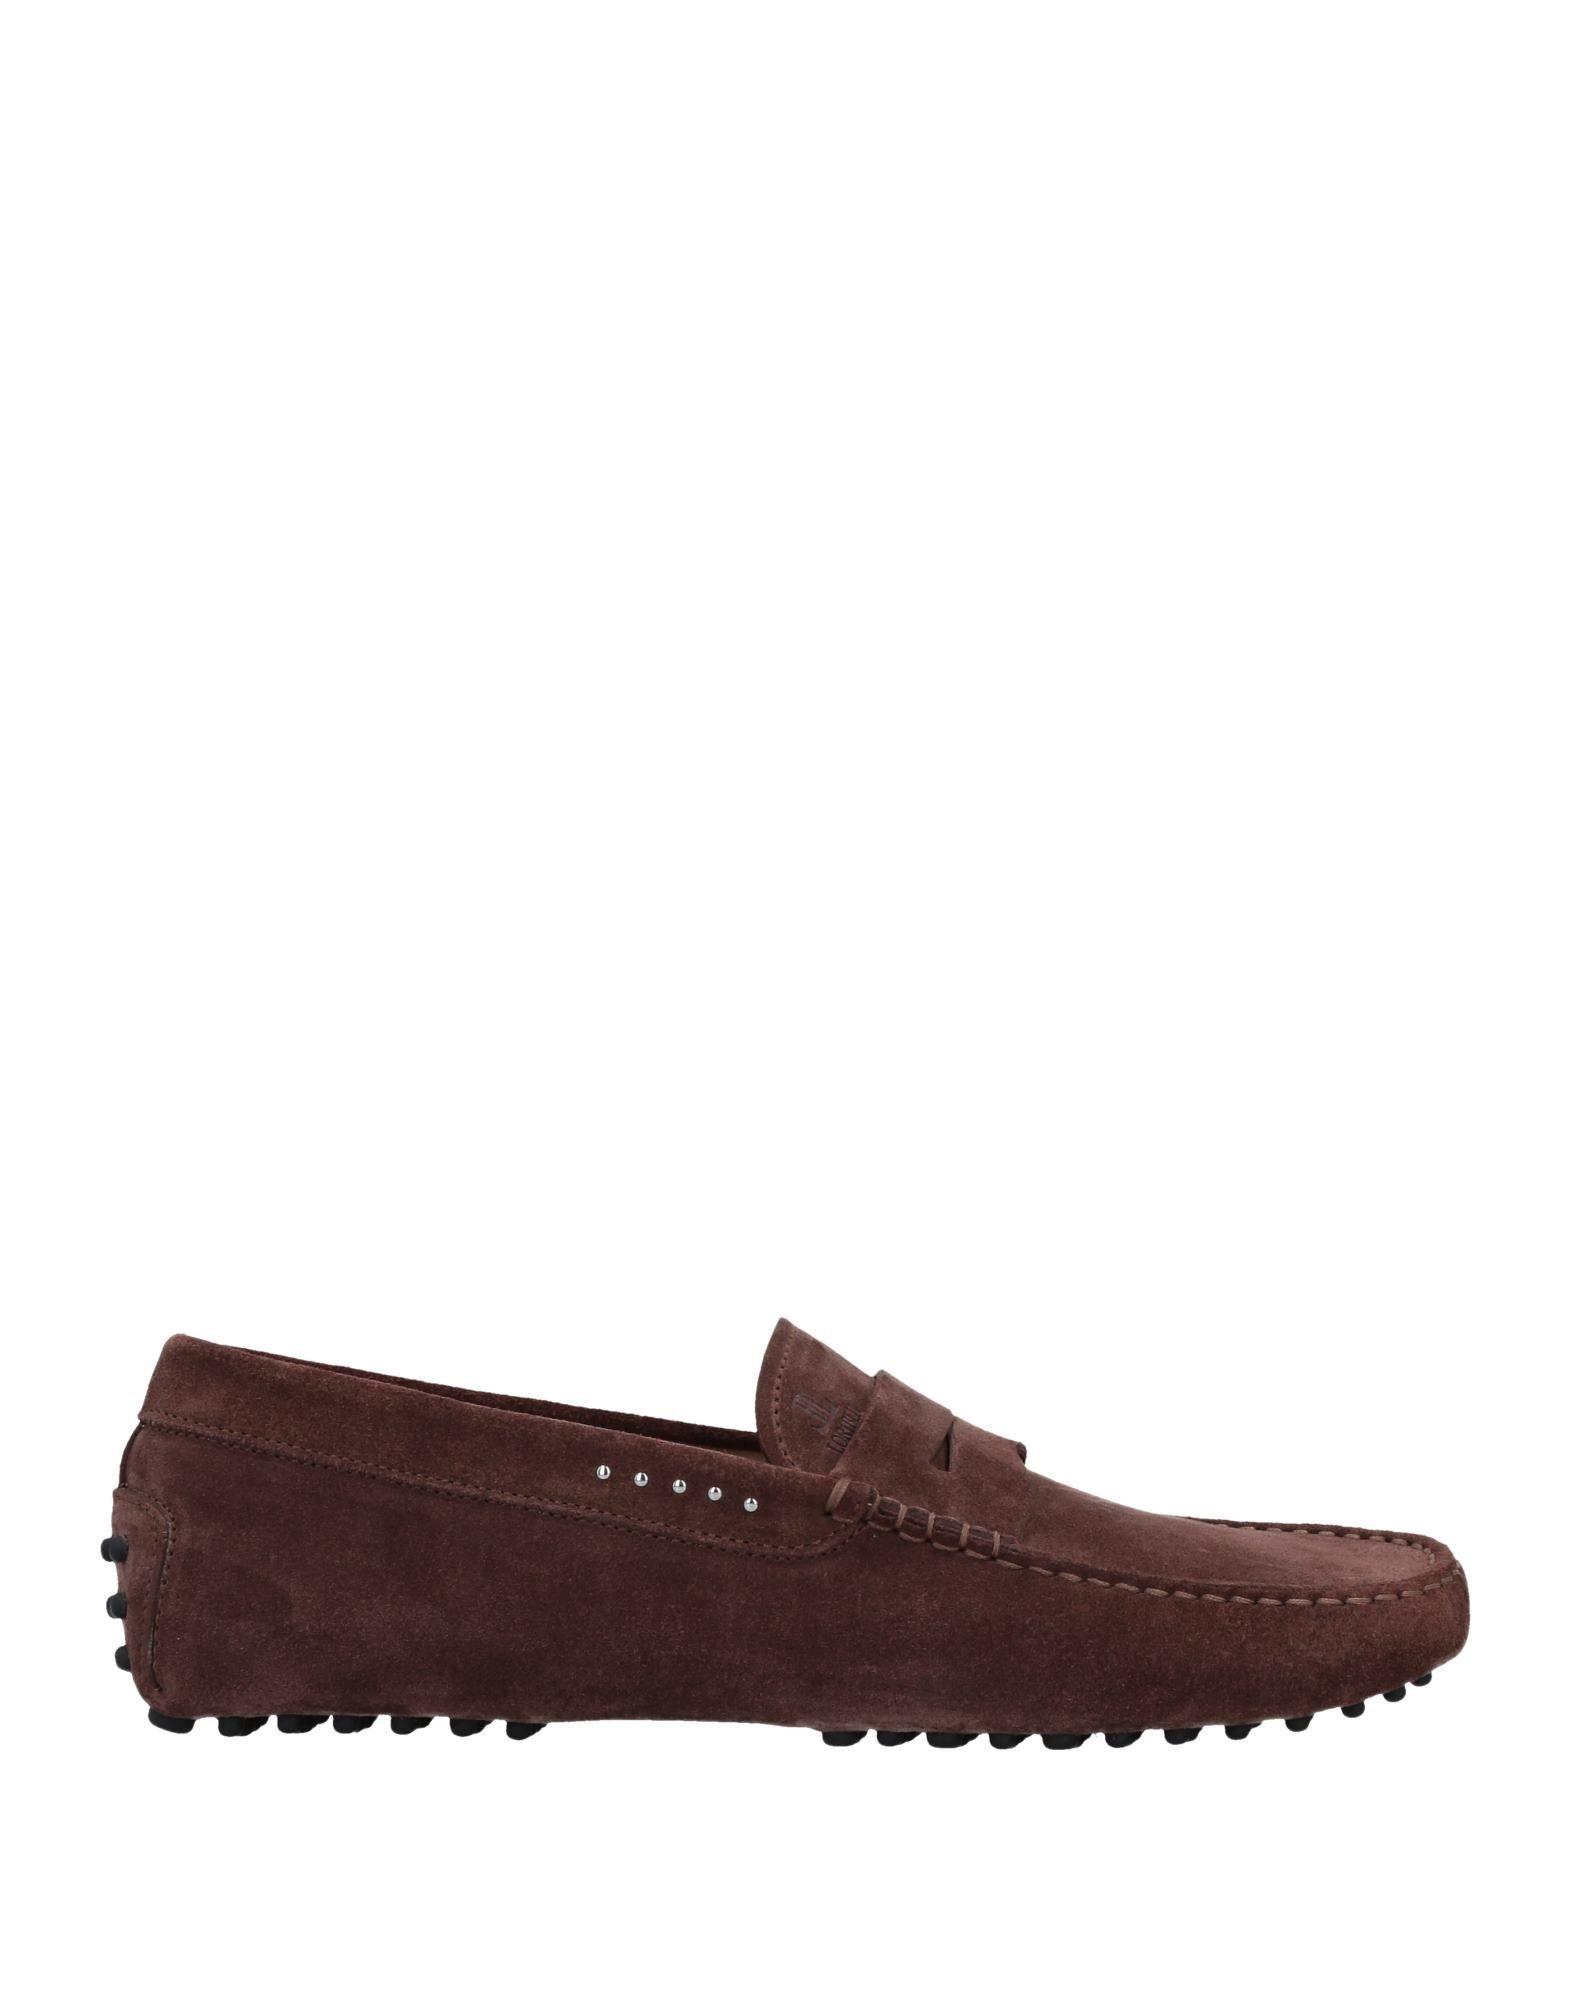 Loriblu Mokassins Qualität Herren  11510578SM Gute Qualität Mokassins beliebte Schuhe 3b2294